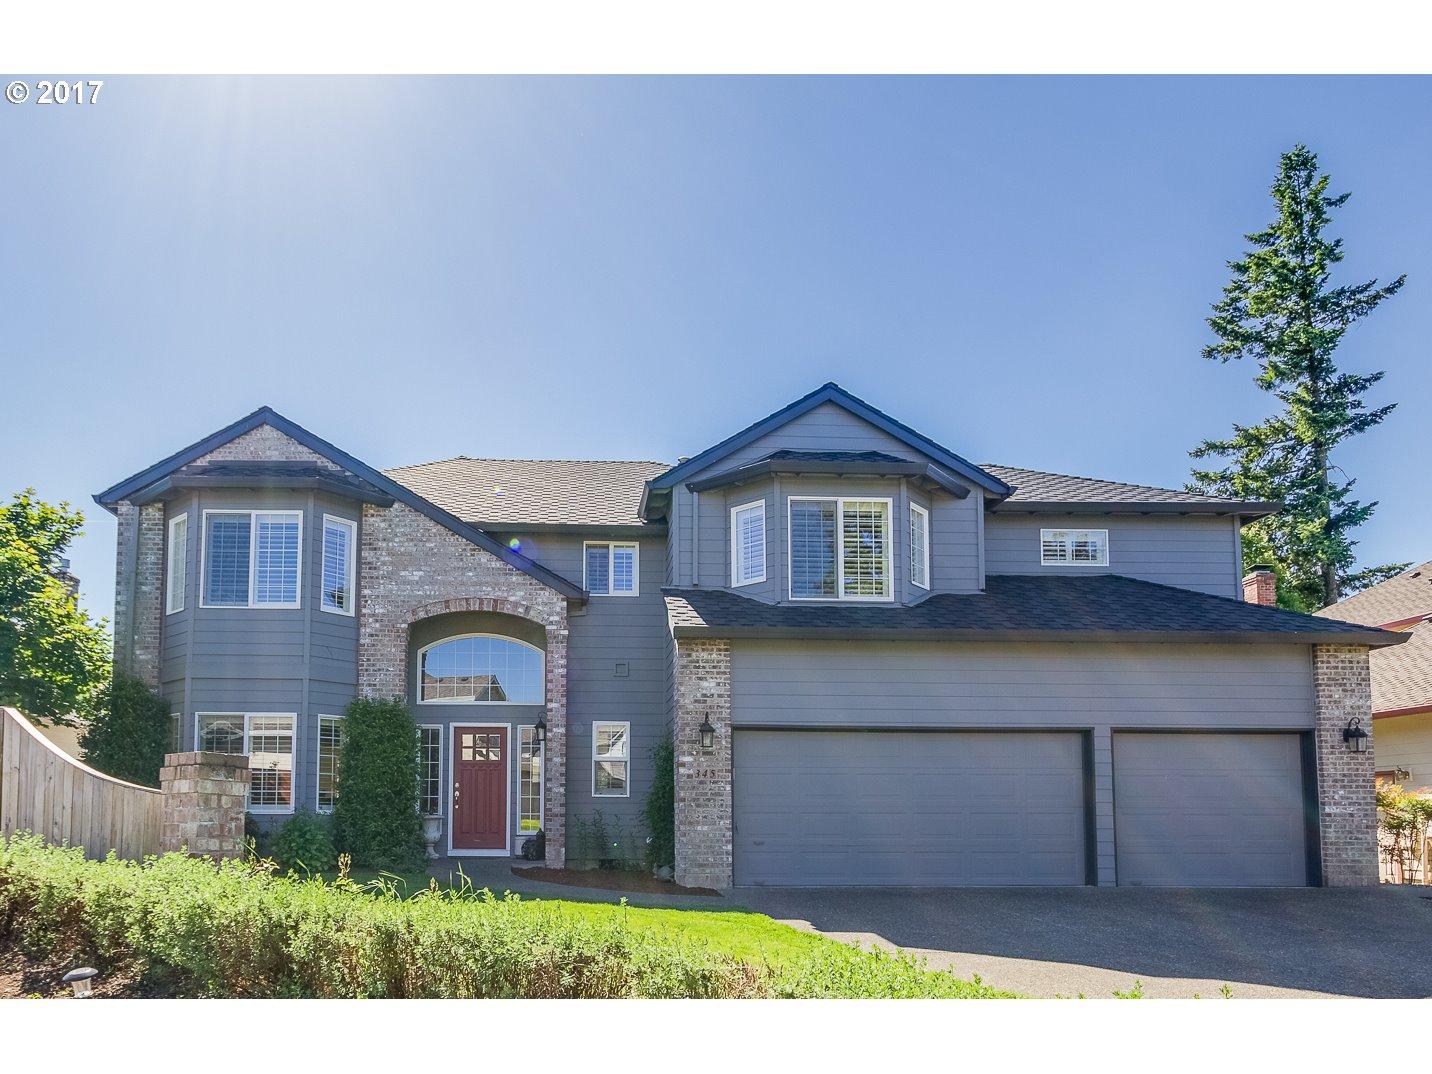 345 SW 169TH CT, Beaverton, OR 97006